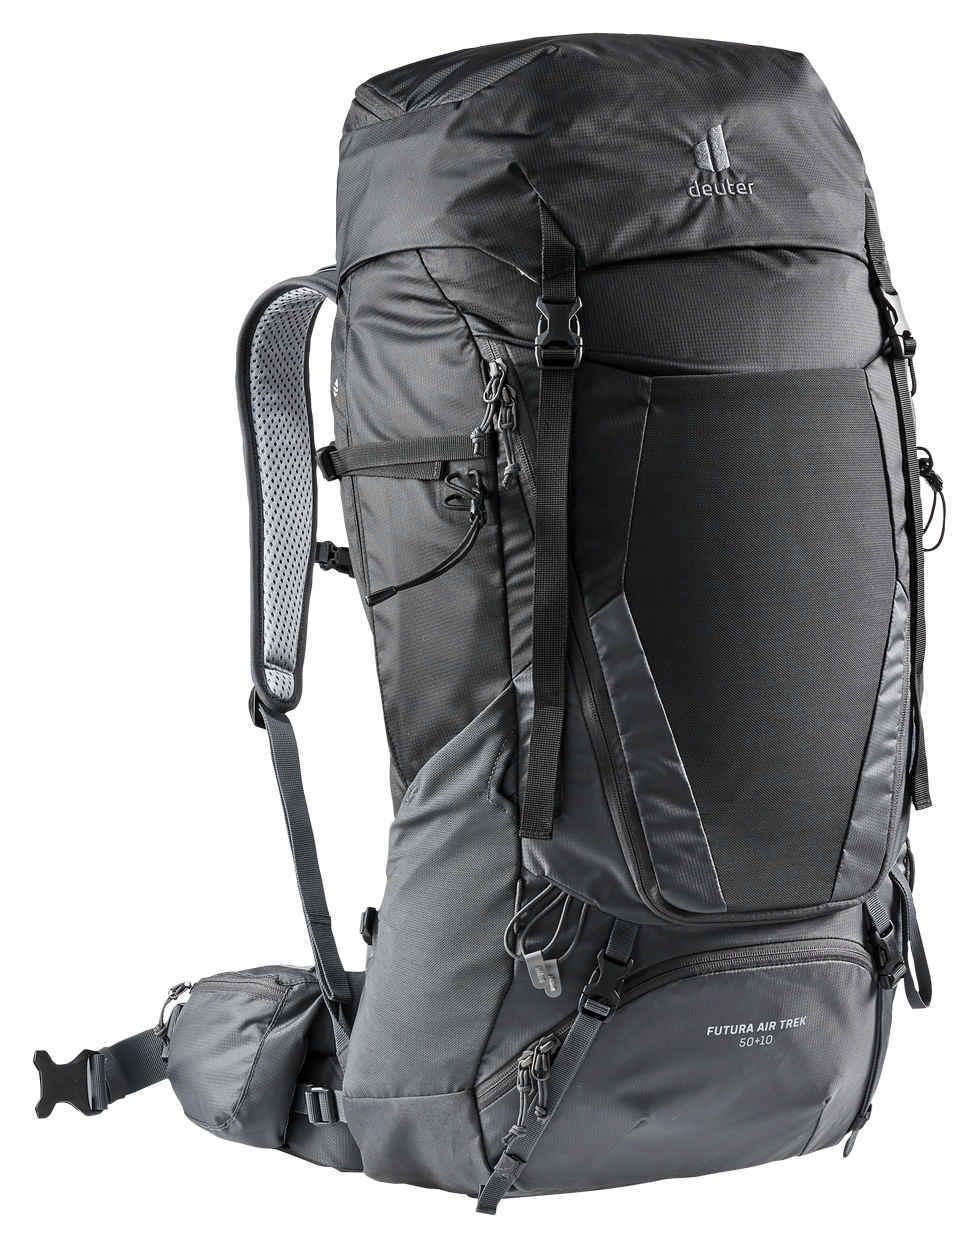 Туристические рюкзаки легкие Рюкзак Deuter Futura Air Trek 50+10 (2021) 3402121-7403-Futura_Air_Trek_50_10-d00.jpg